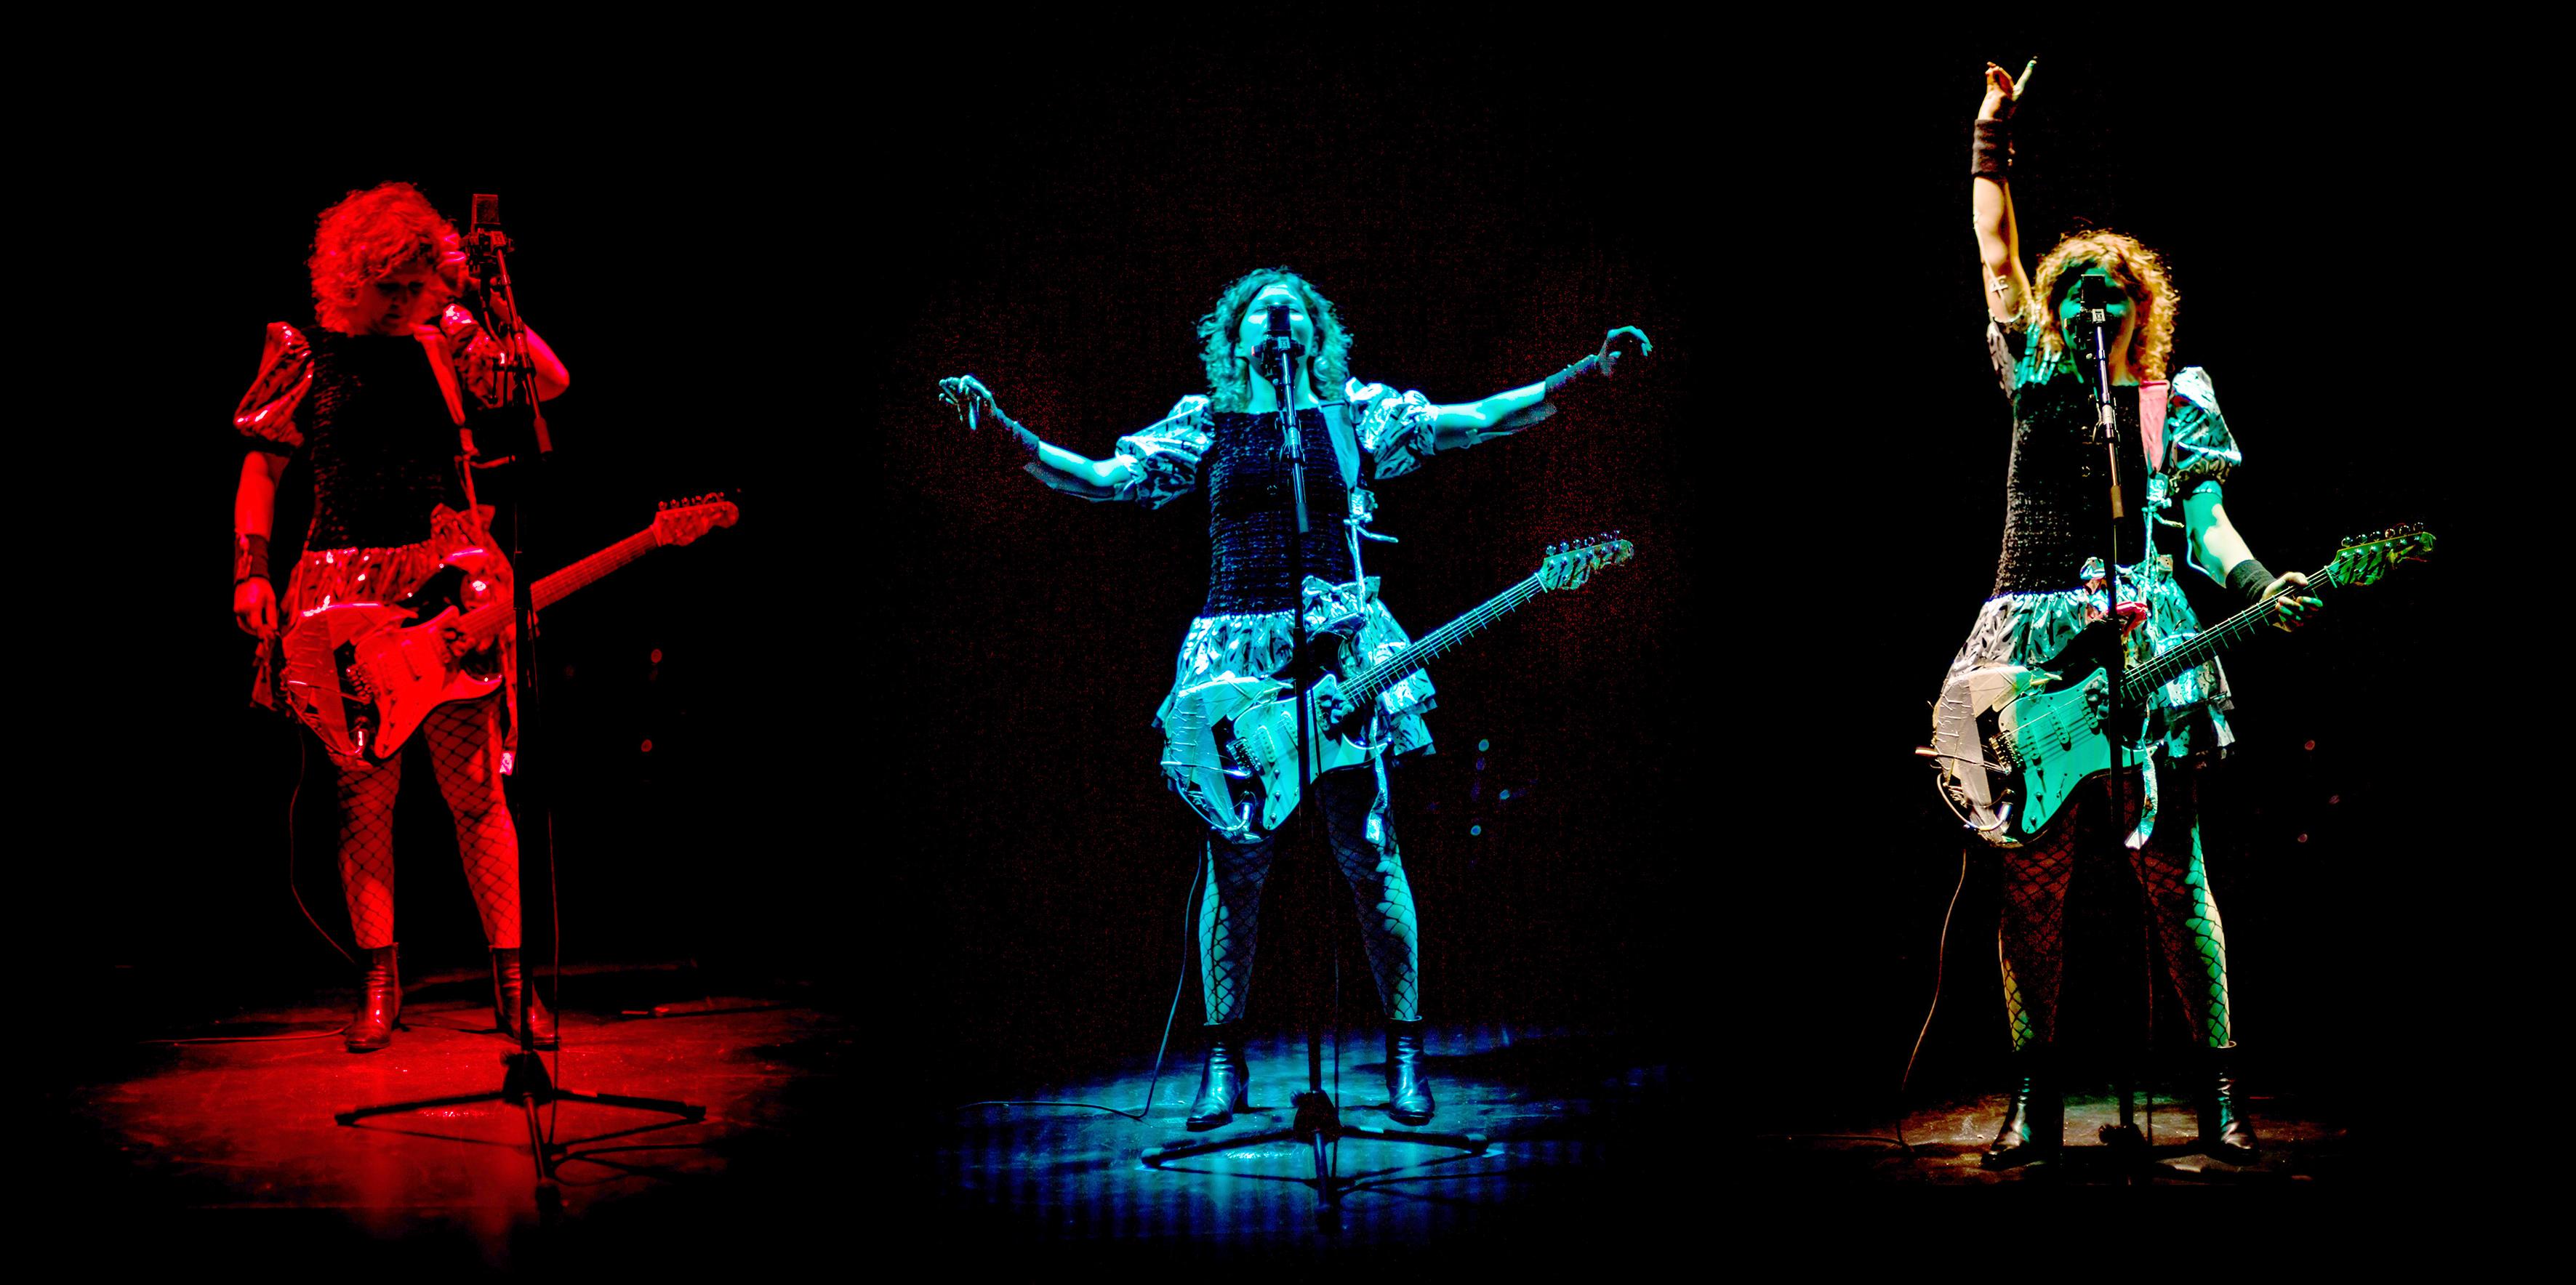 Music Live - Frauke Aulbert - Foto Gerhard Kuehne 3543x1768